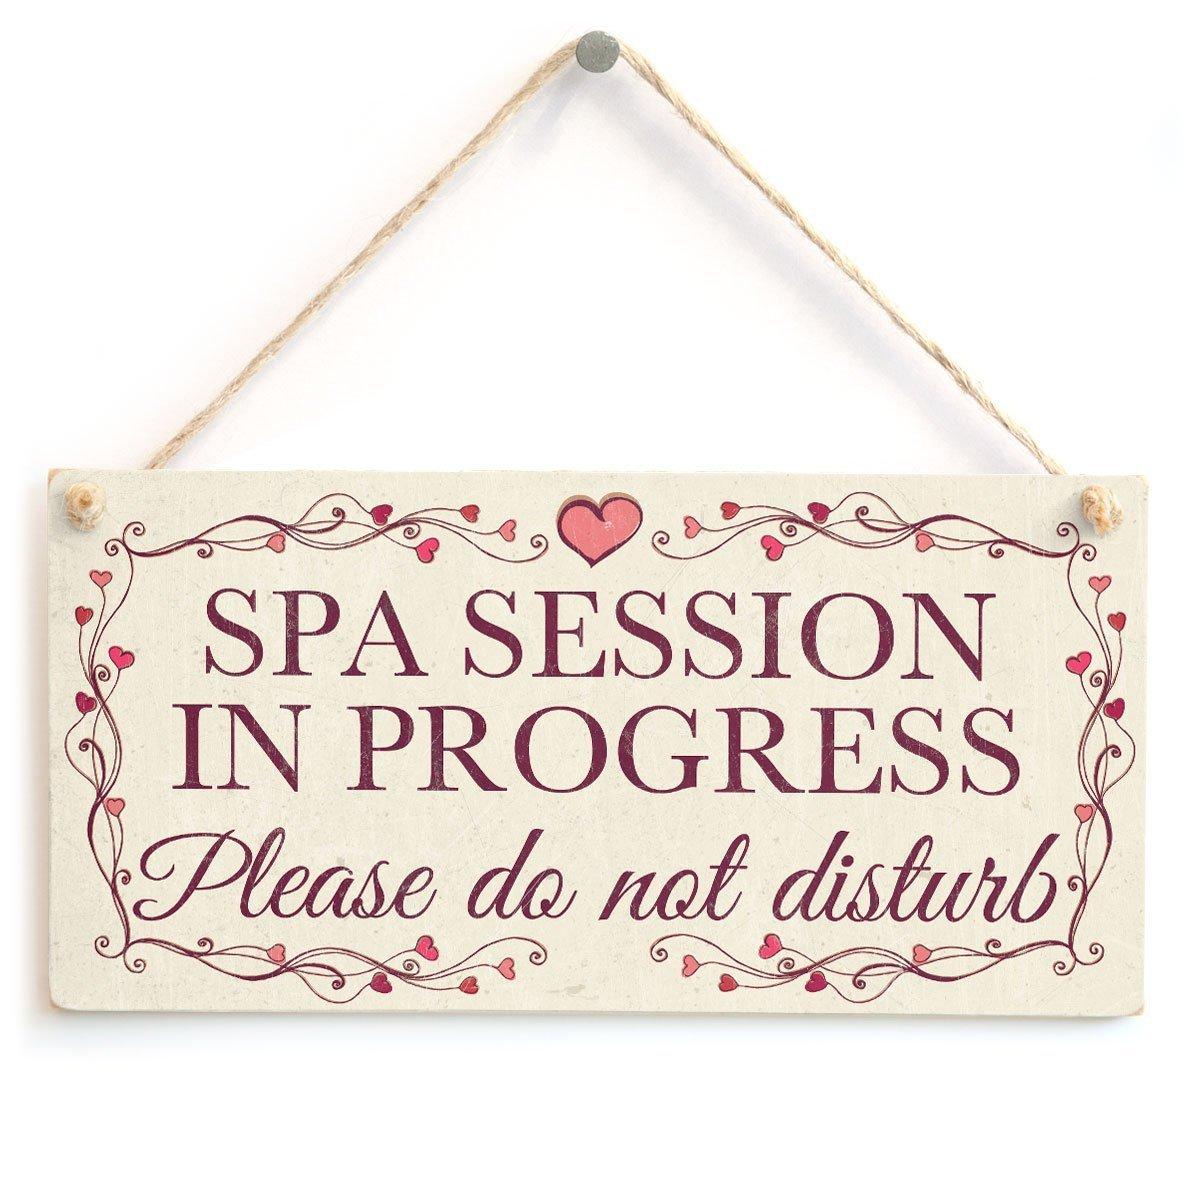 Meijiafei Spa Session In Progress Please do not disturb - Pretty Love Heart Frame Design Sign /Plaque 10''x5''